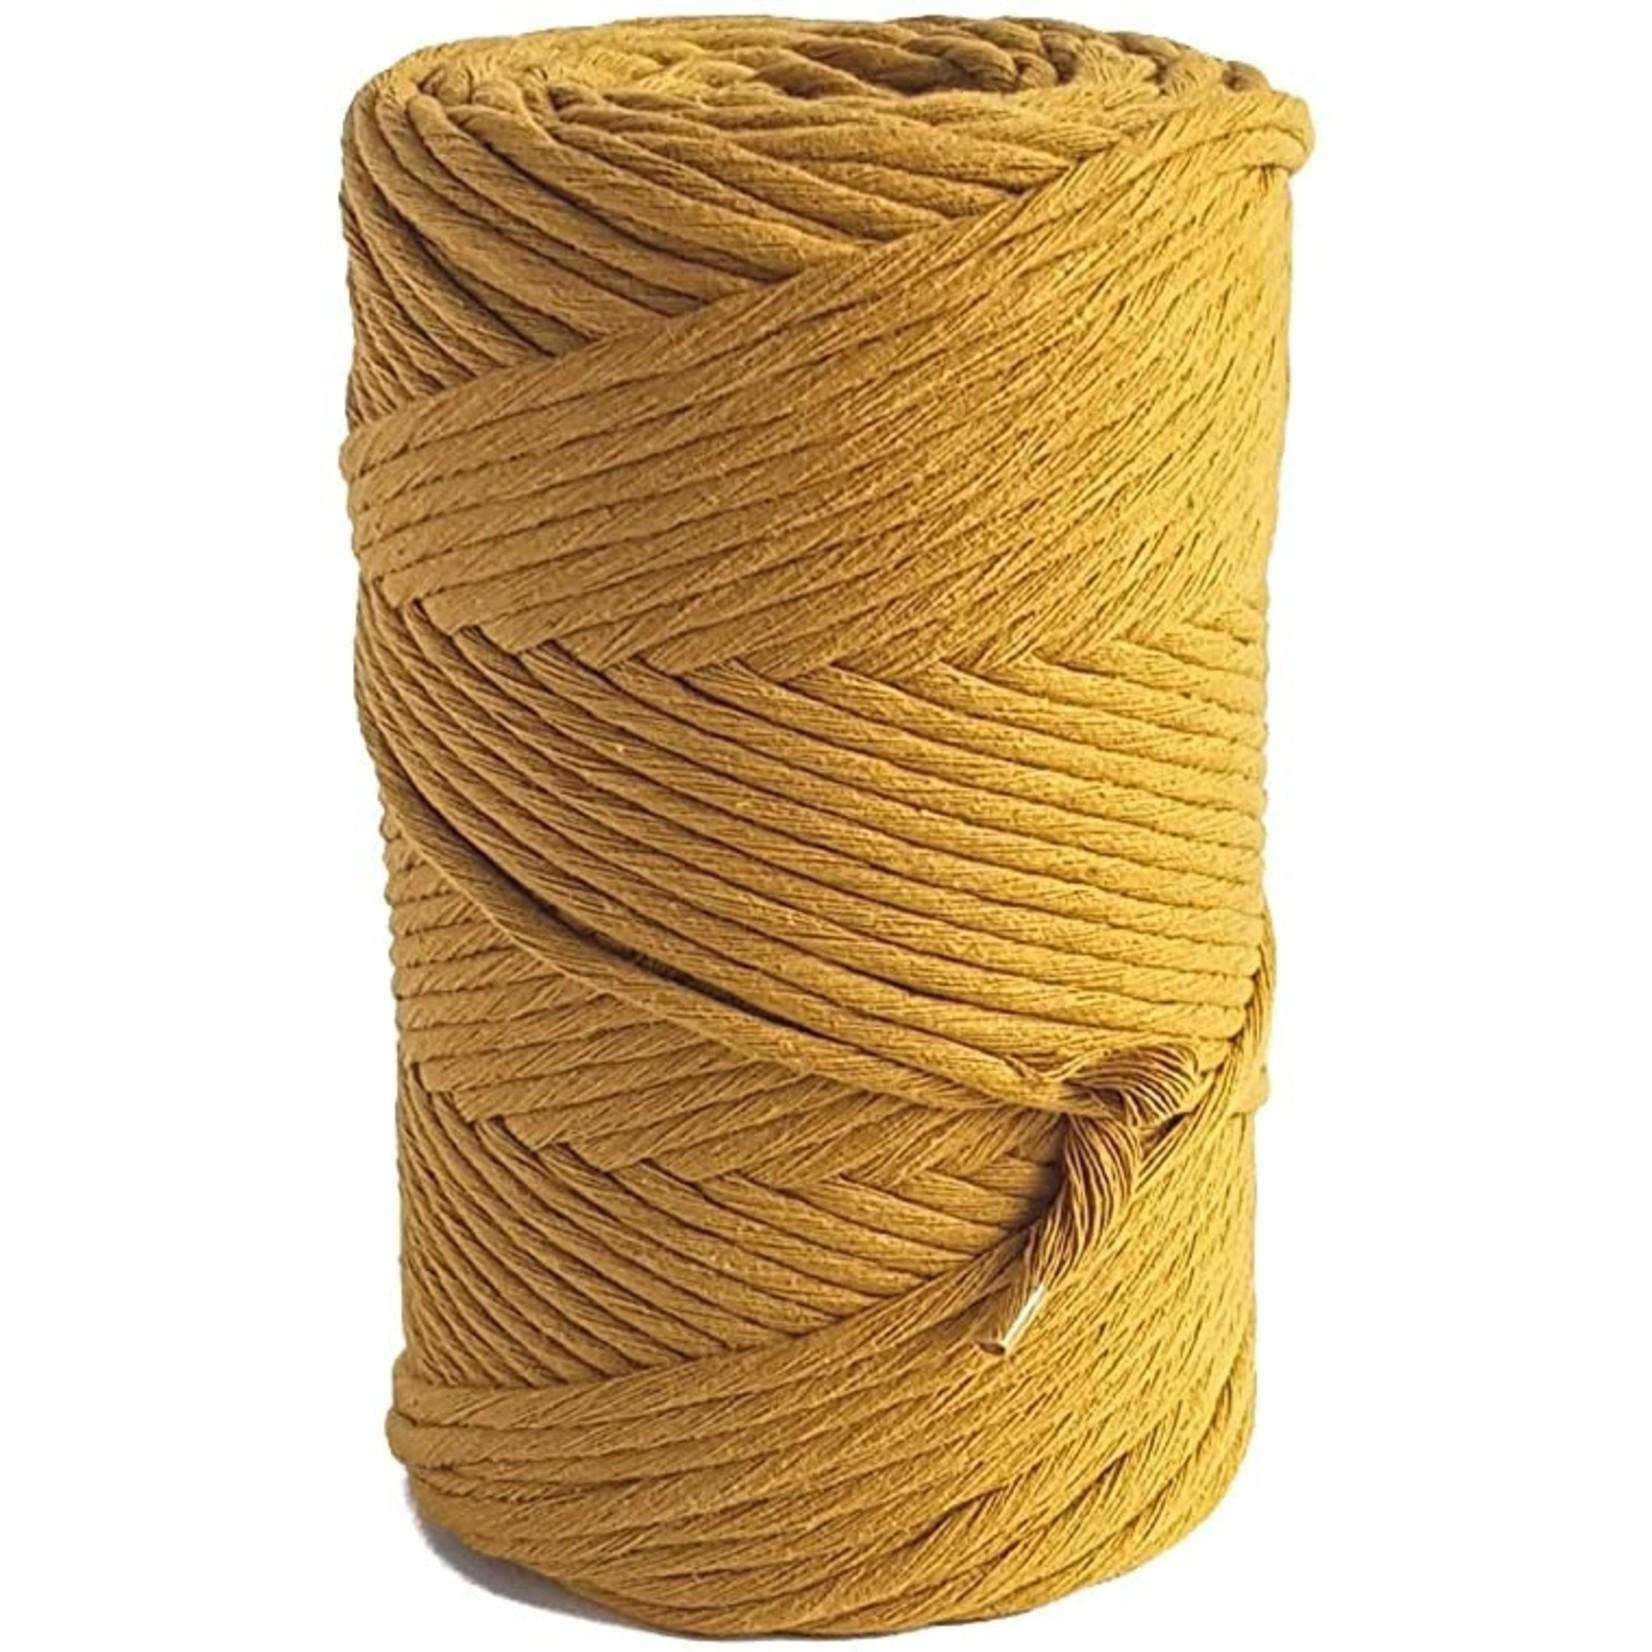 Cord - Mustard $1.00 per m